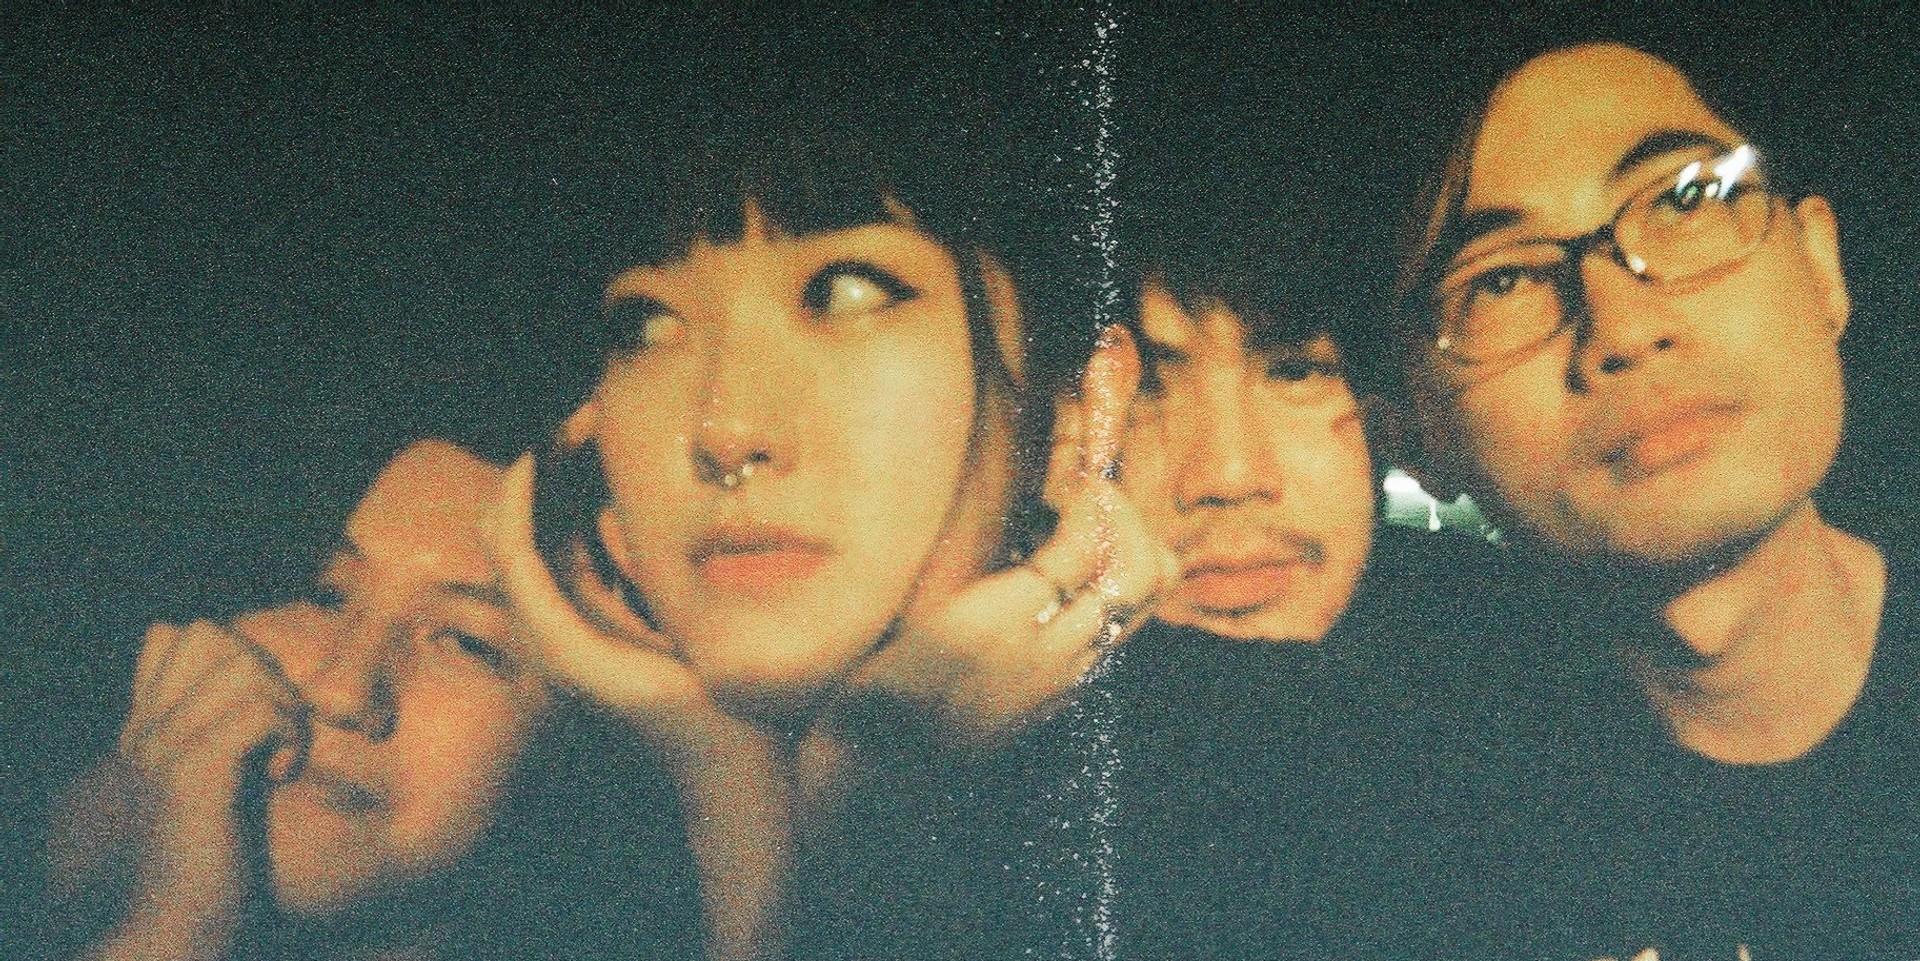 Oddshore releases debut single 'Do You Remember' – listen